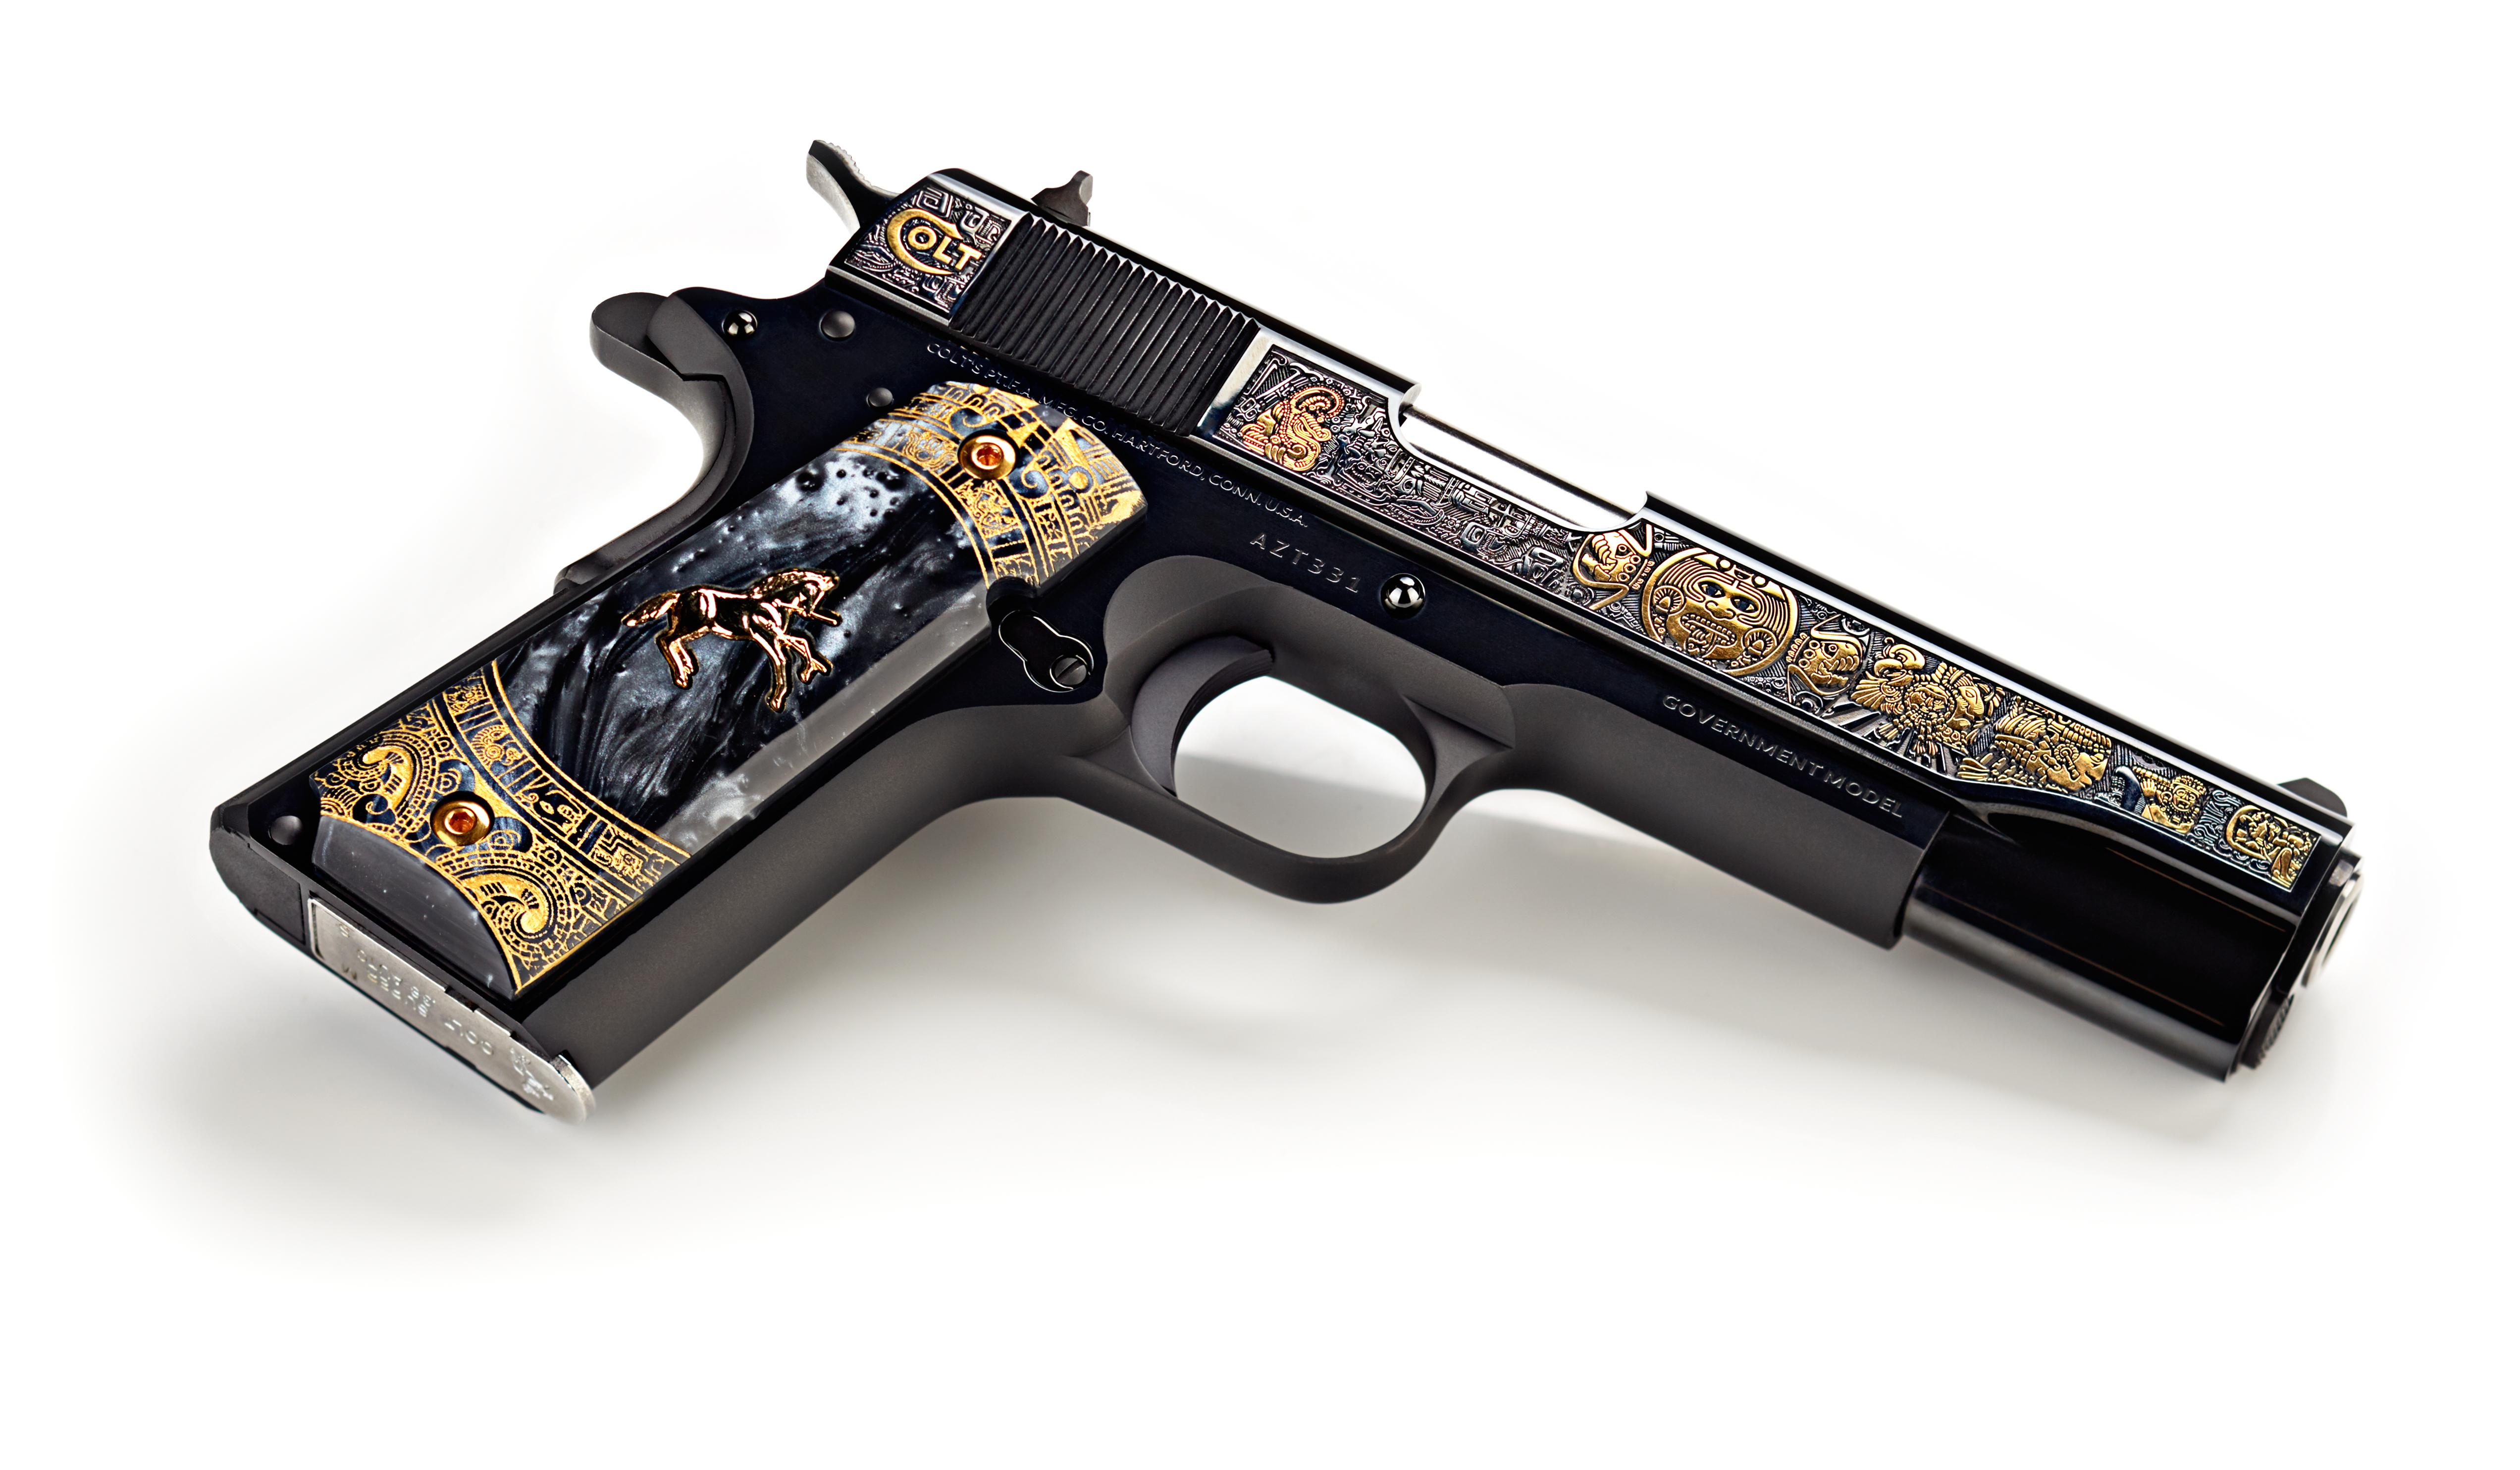 Colt GOVERNMENT CLASSIC USA 45 ACP